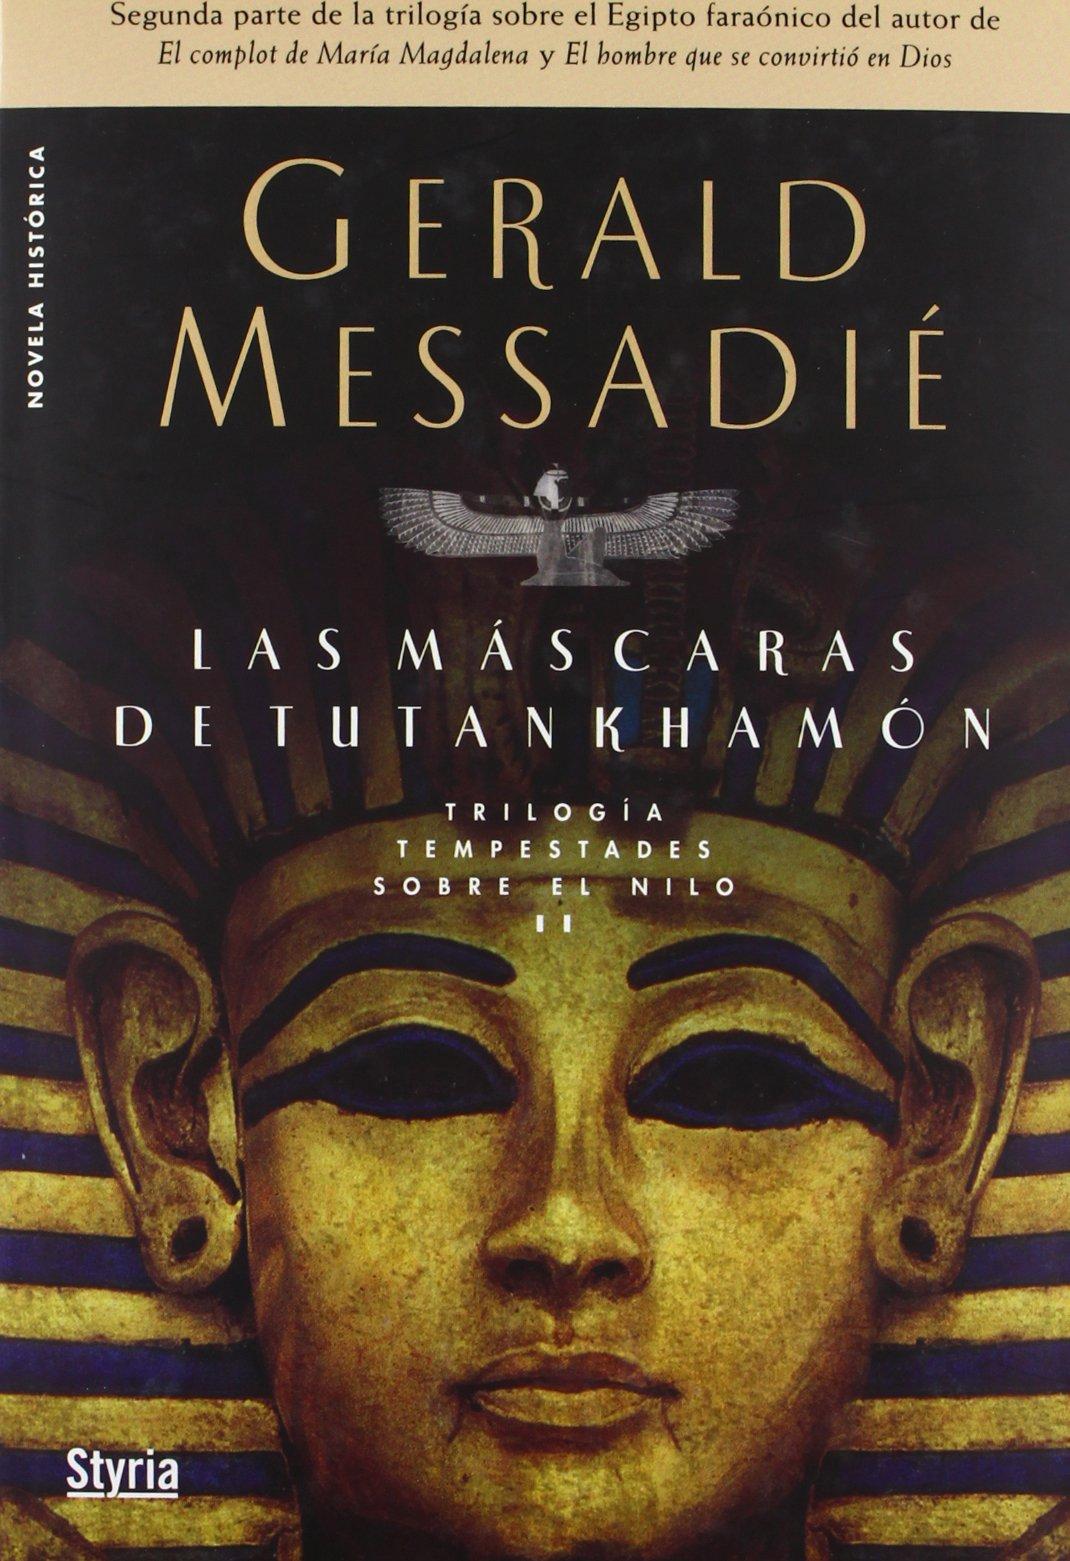 Mascaras De Tutankhamon Oferta (Novela Historica): Amazon.es: Gerald Messadie: Libros